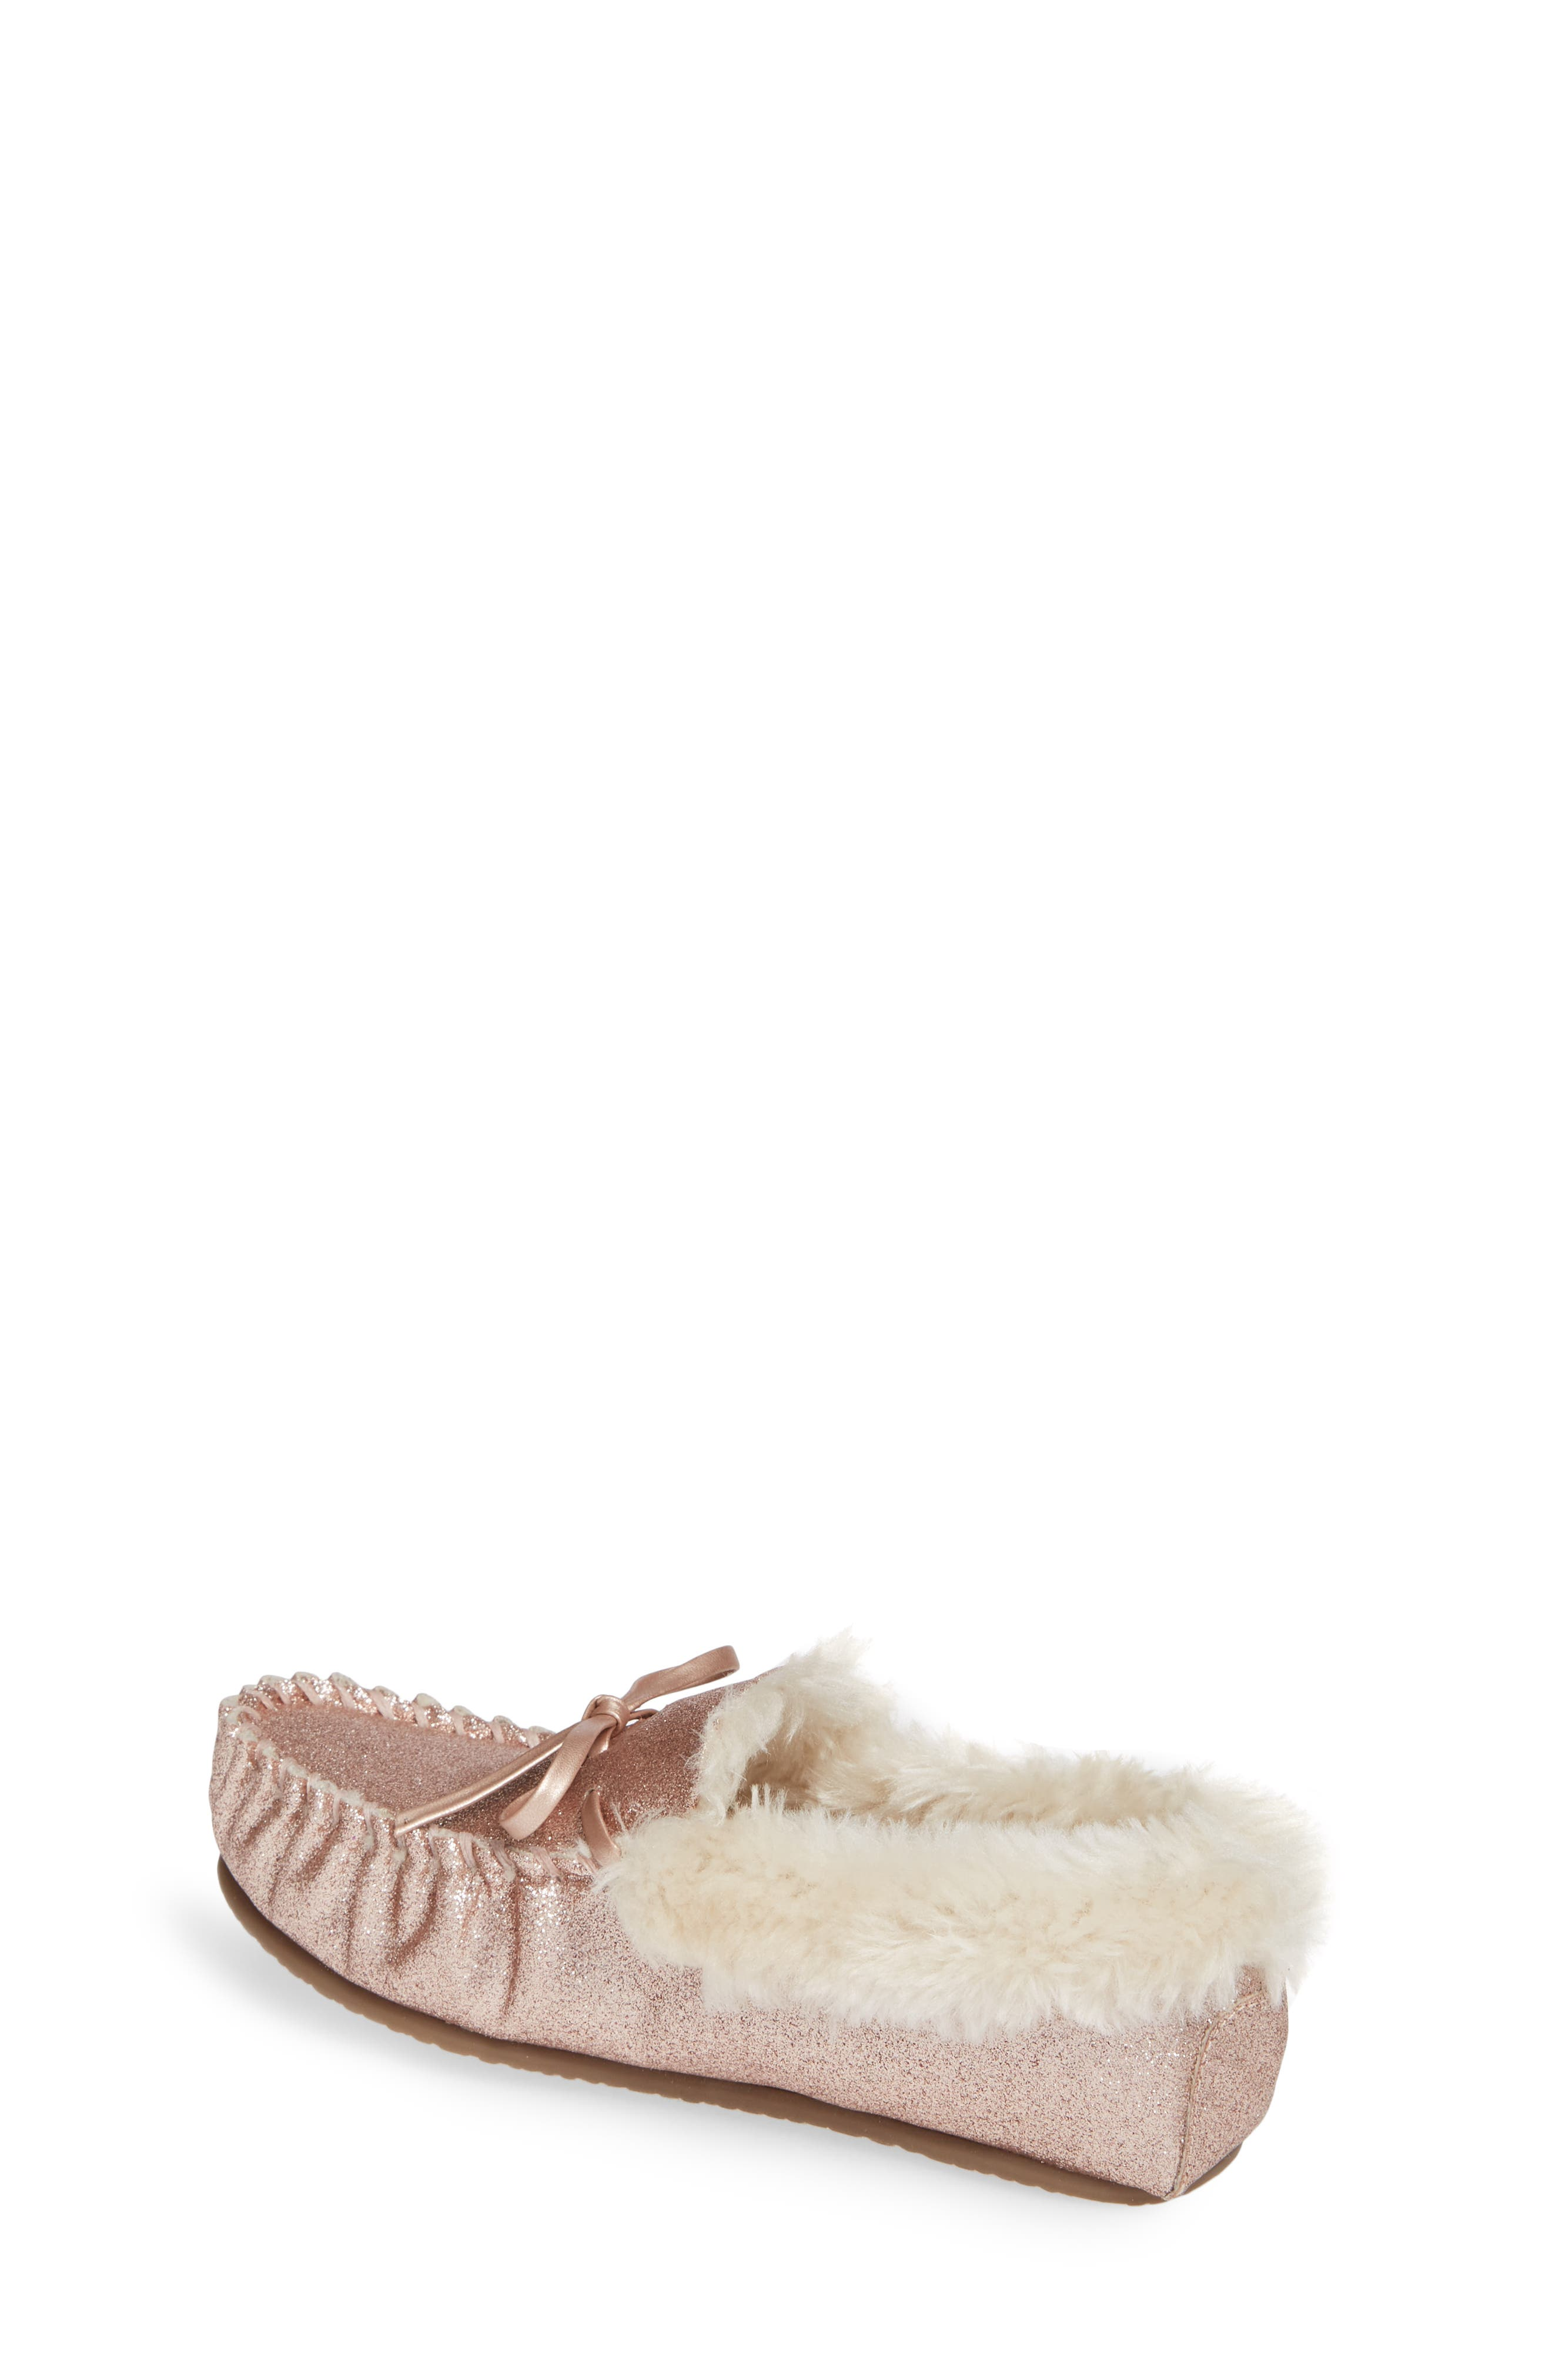 Mila Faux Fur Moccasin Slipper,                             Alternate thumbnail 2, color,                             710